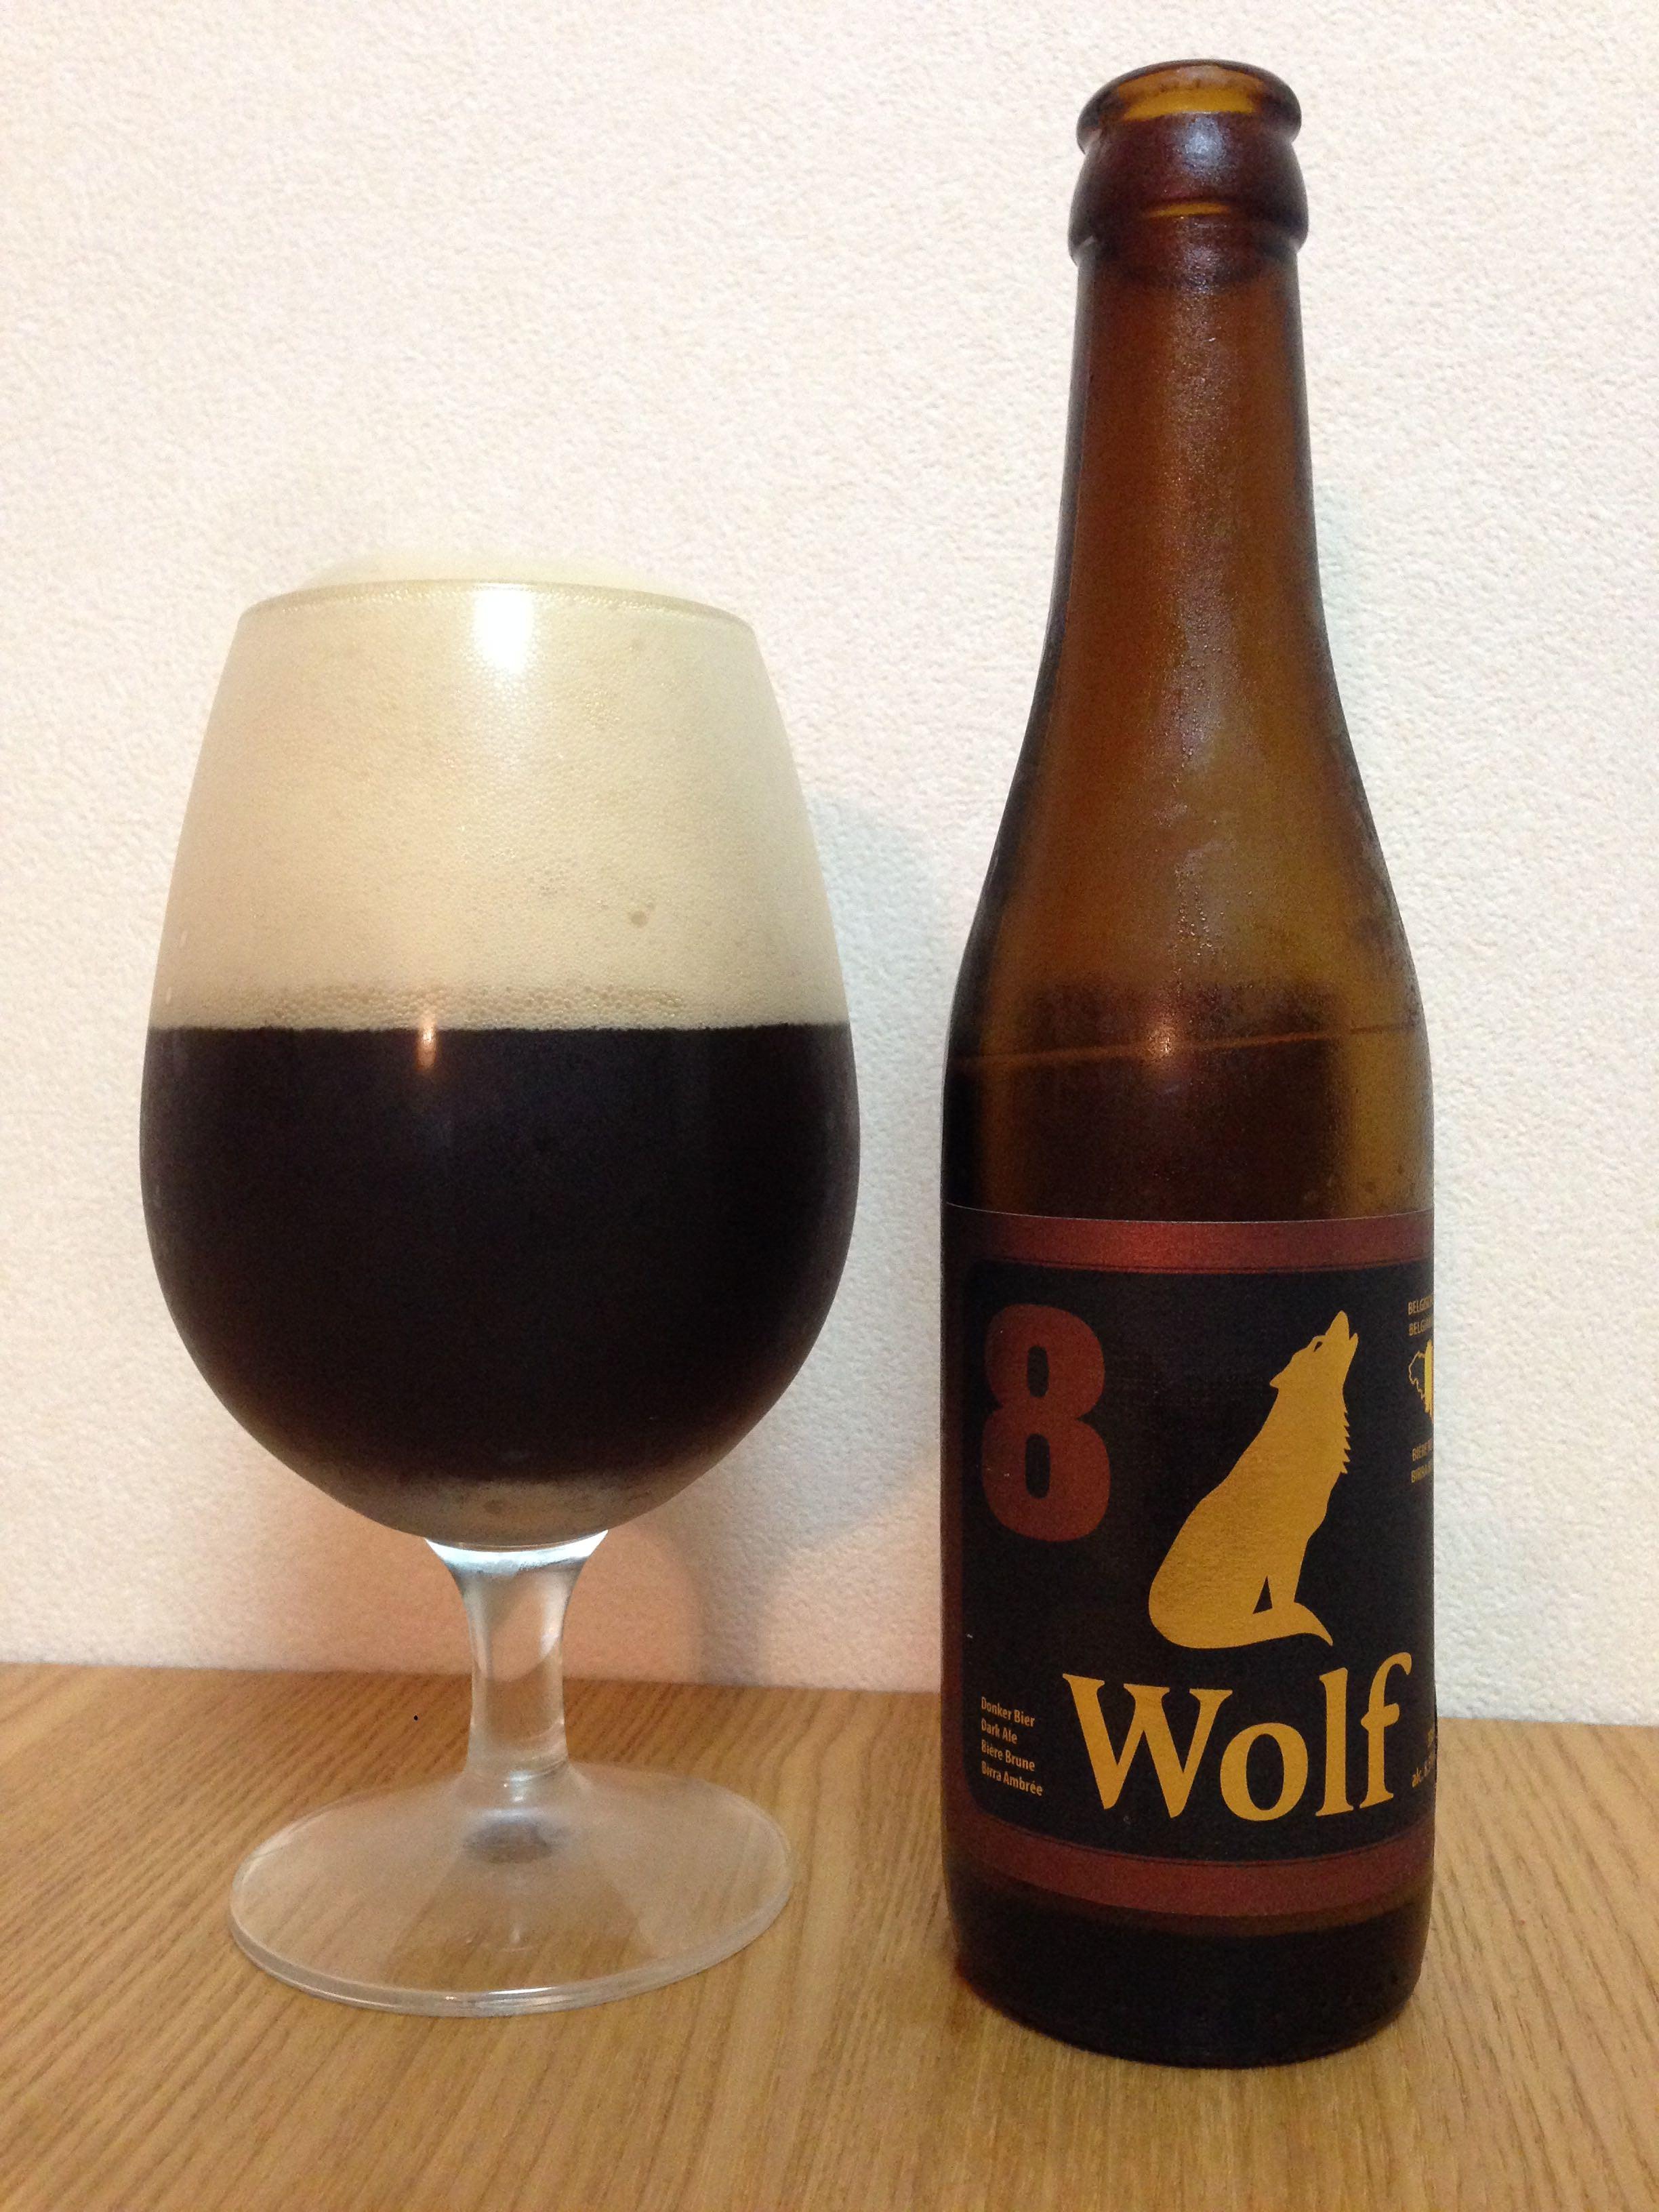 Wolf 8(ウルフ 8)